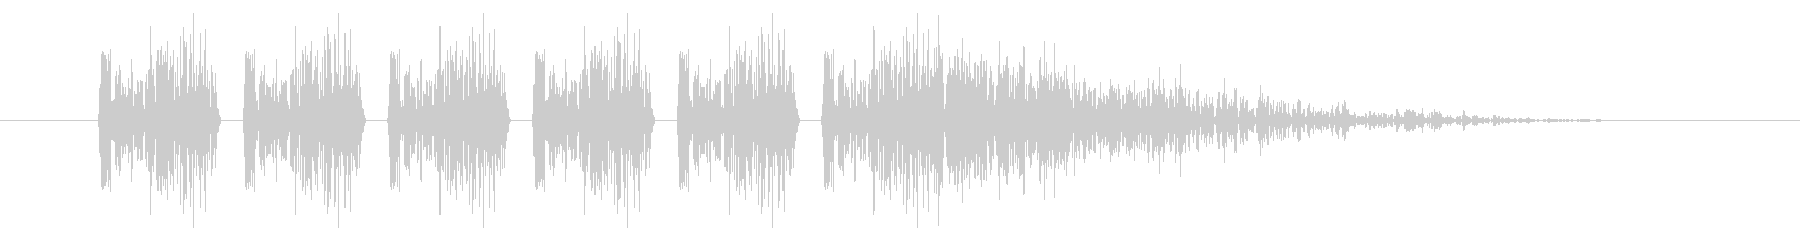 SNES シューティング01-07(ダメの未再生の波形